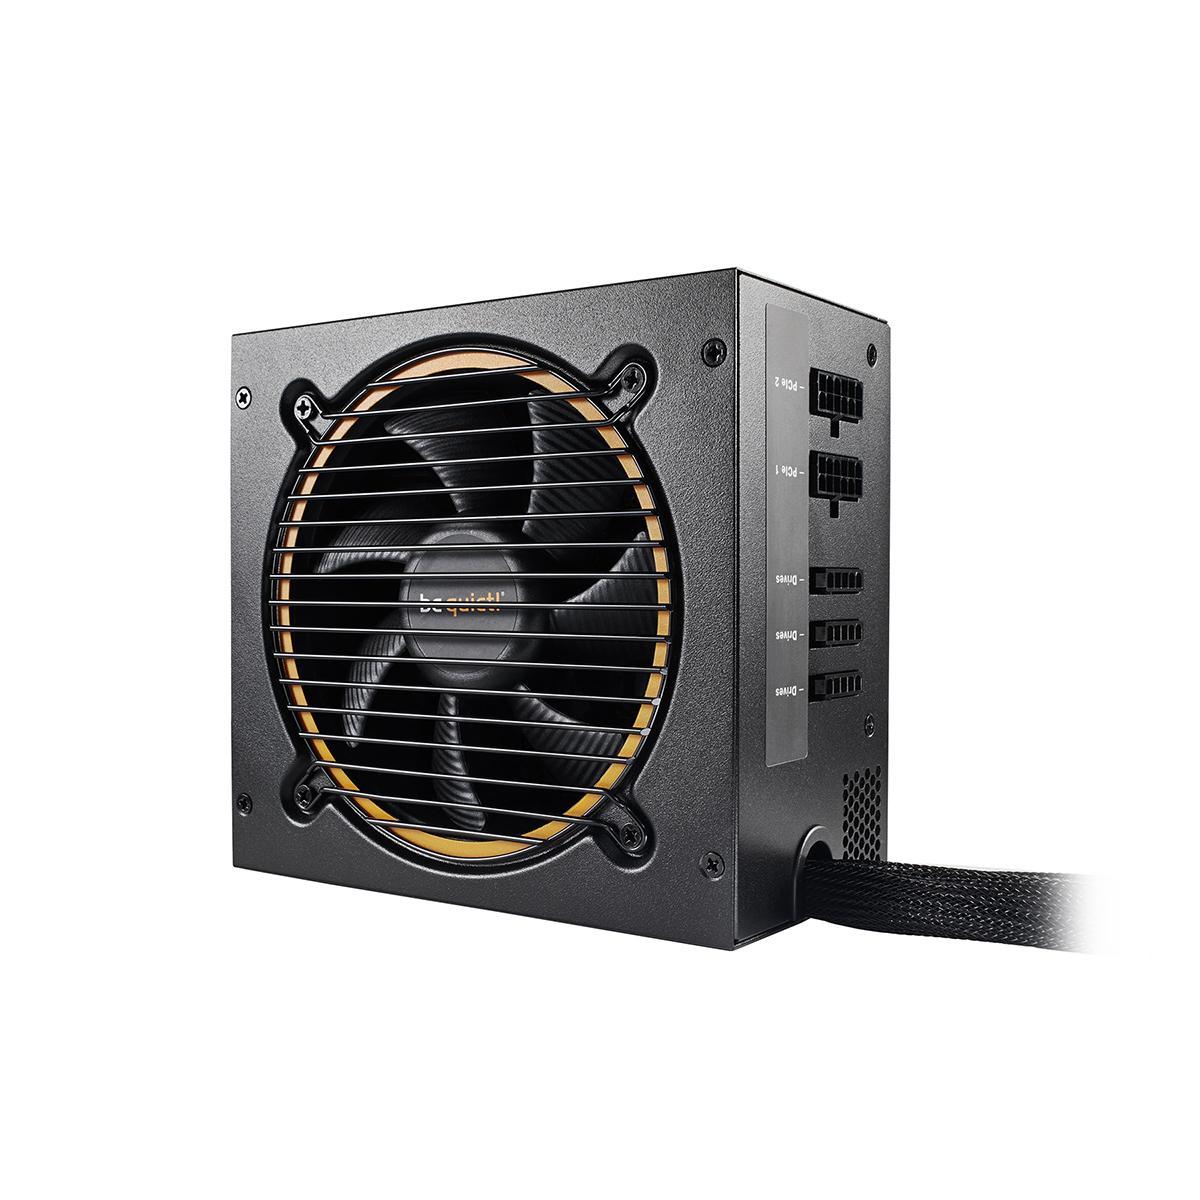 be quiet! Pure Power 11 CM 500 W 80+ Gold Certified Semi-modular ATX Power Supply